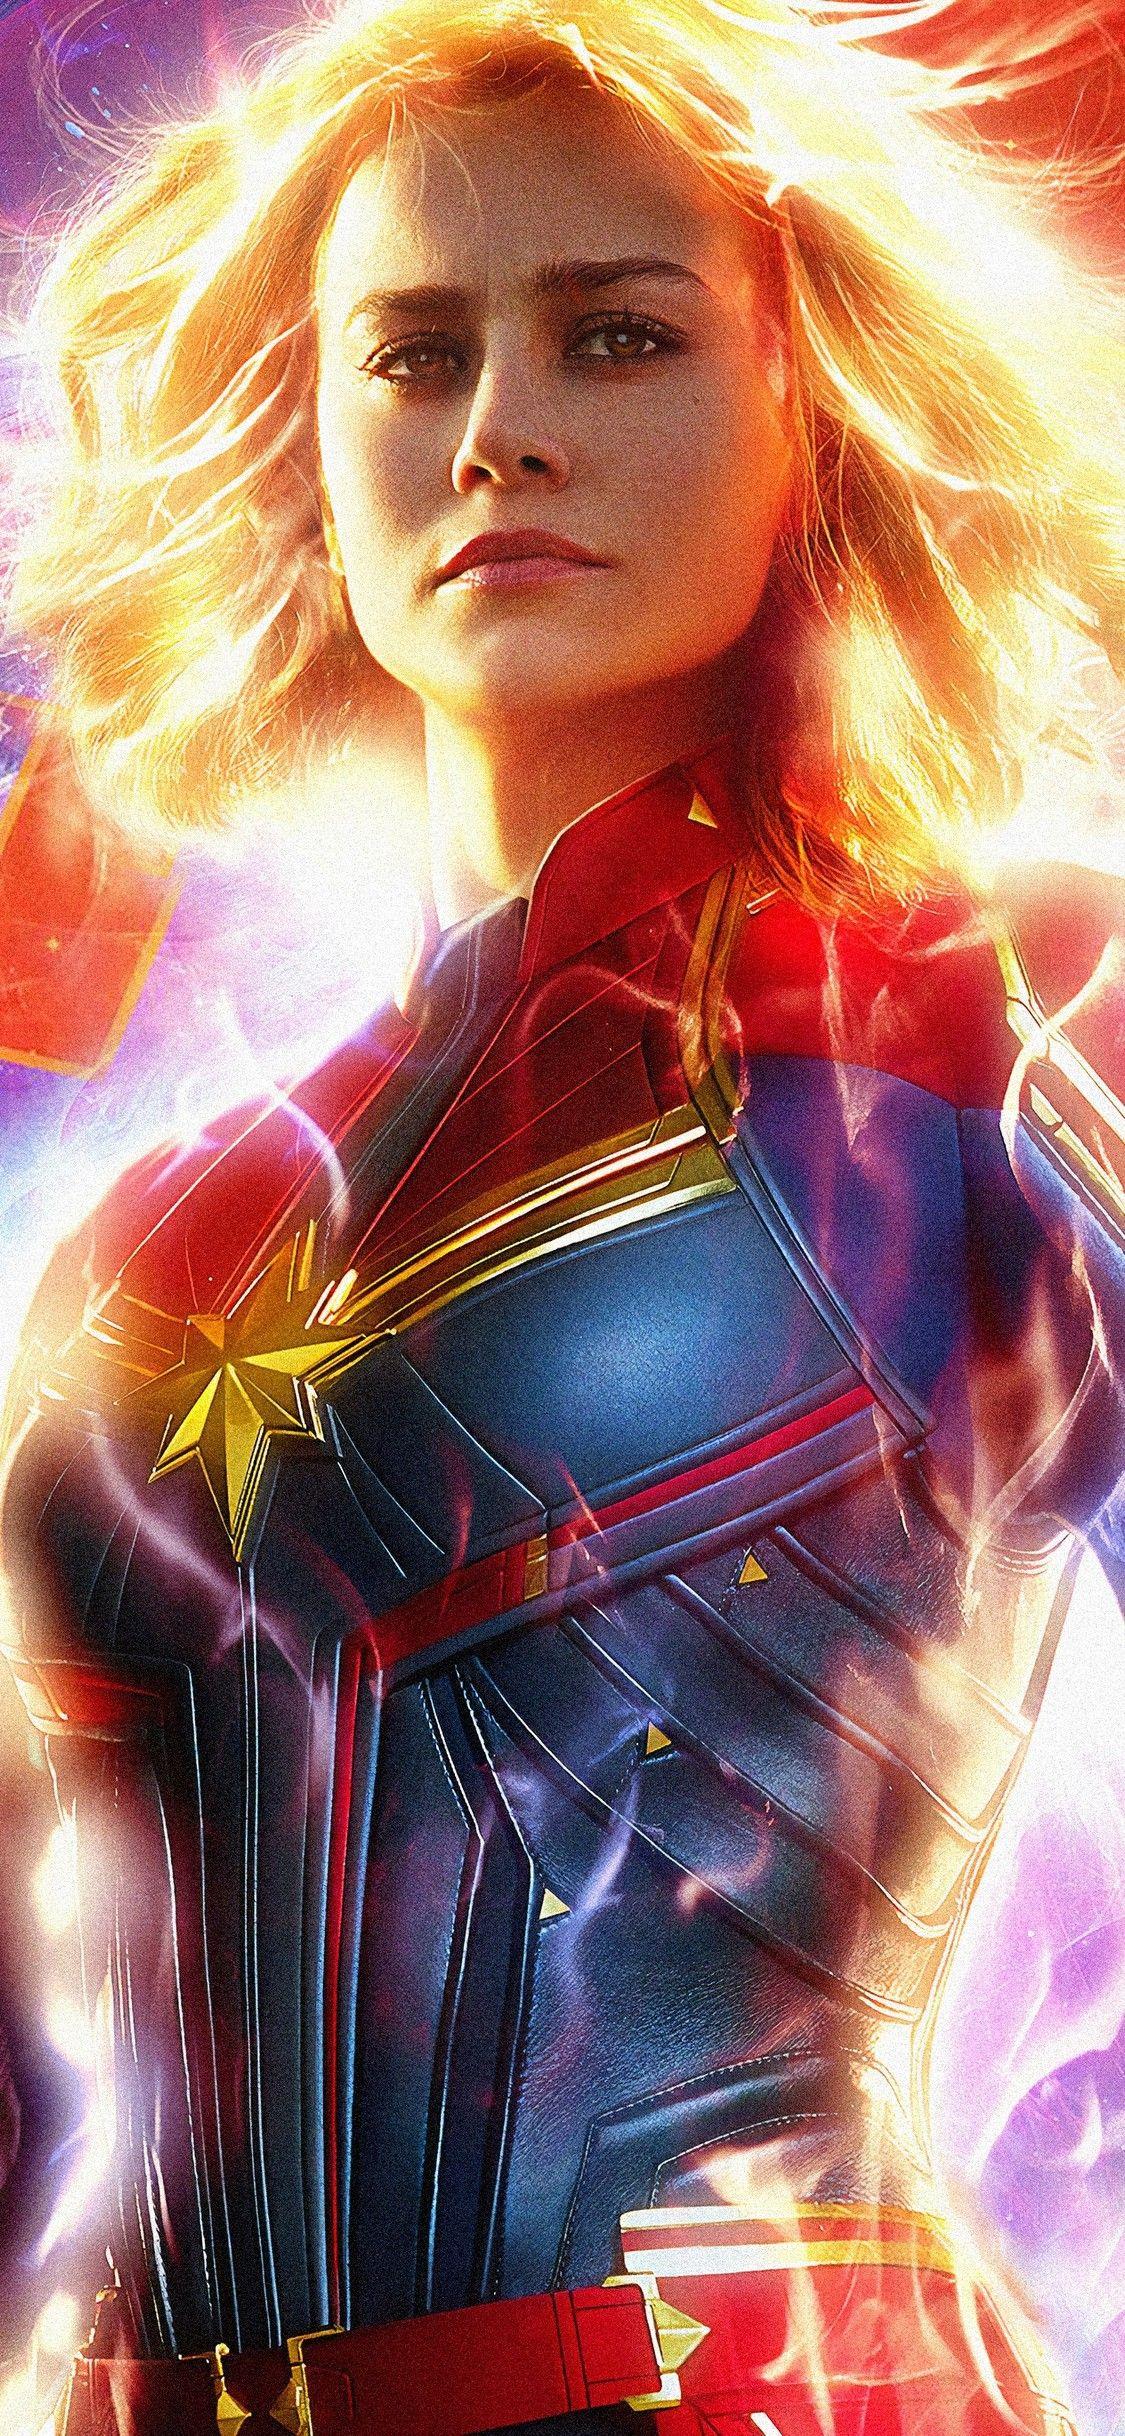 1125x2436 captain marvel movie 2019 5k iphone xs,iphone 10,iphone x